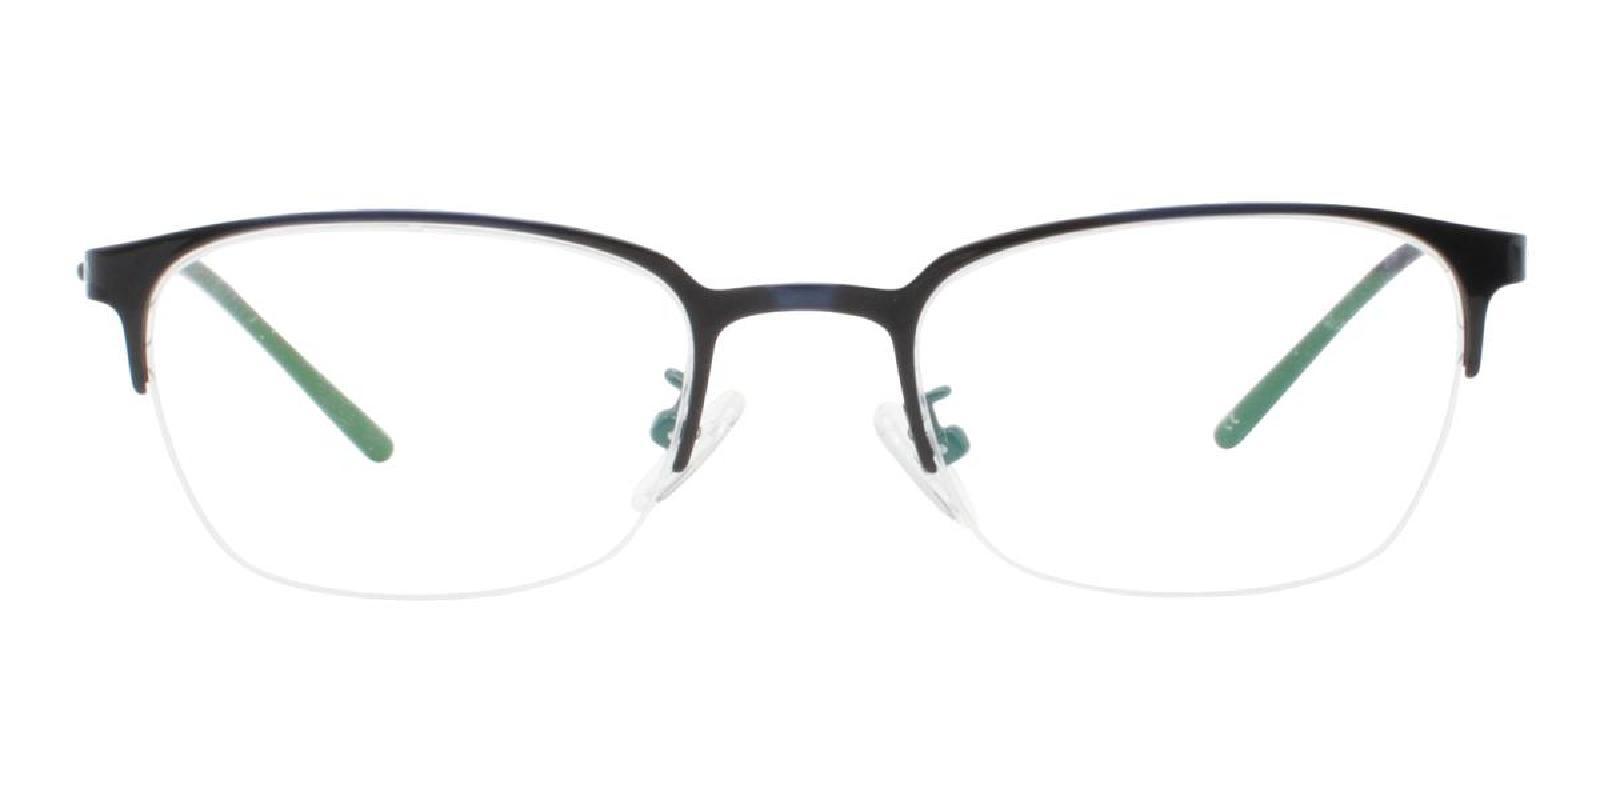 Wavain-Blue-Rectangle-Metal-Eyeglasses-detail